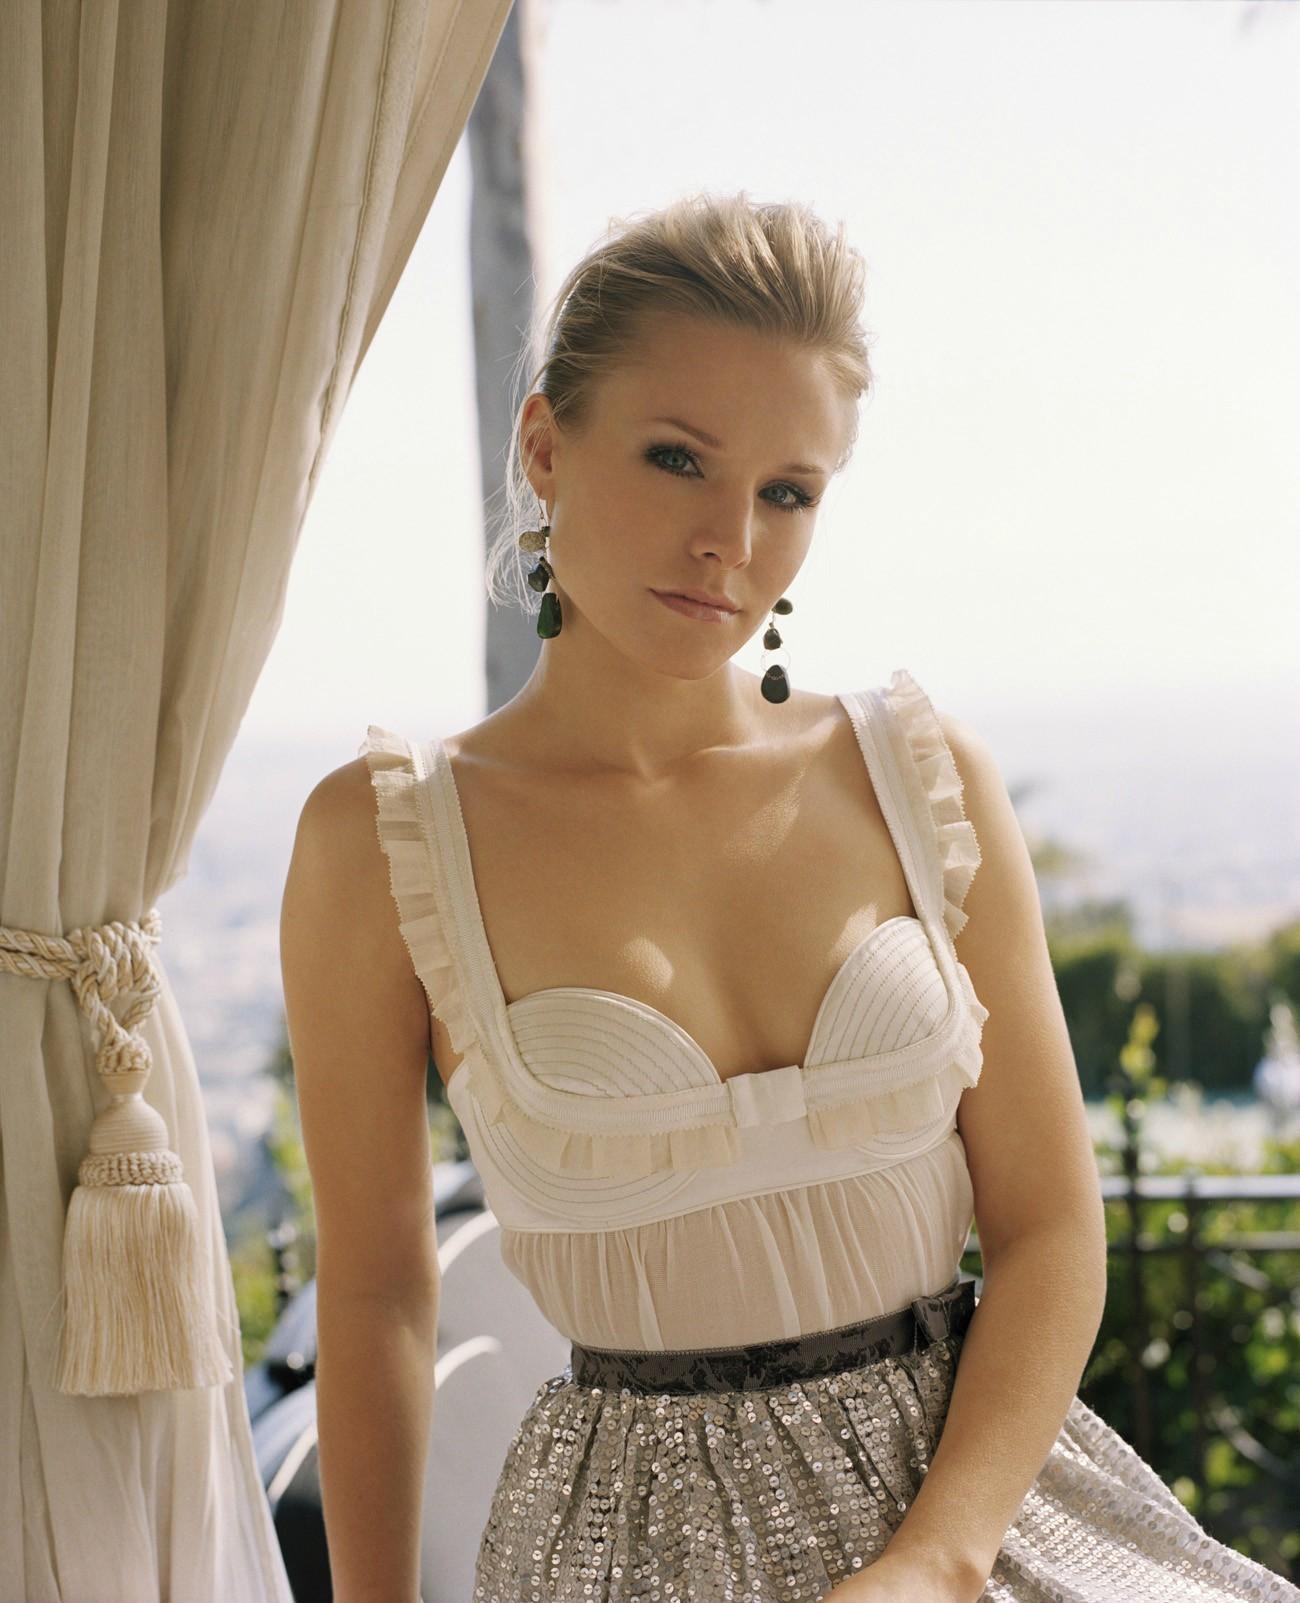 Wallpaper Women Model Blonde Actress Fashion Lingerie